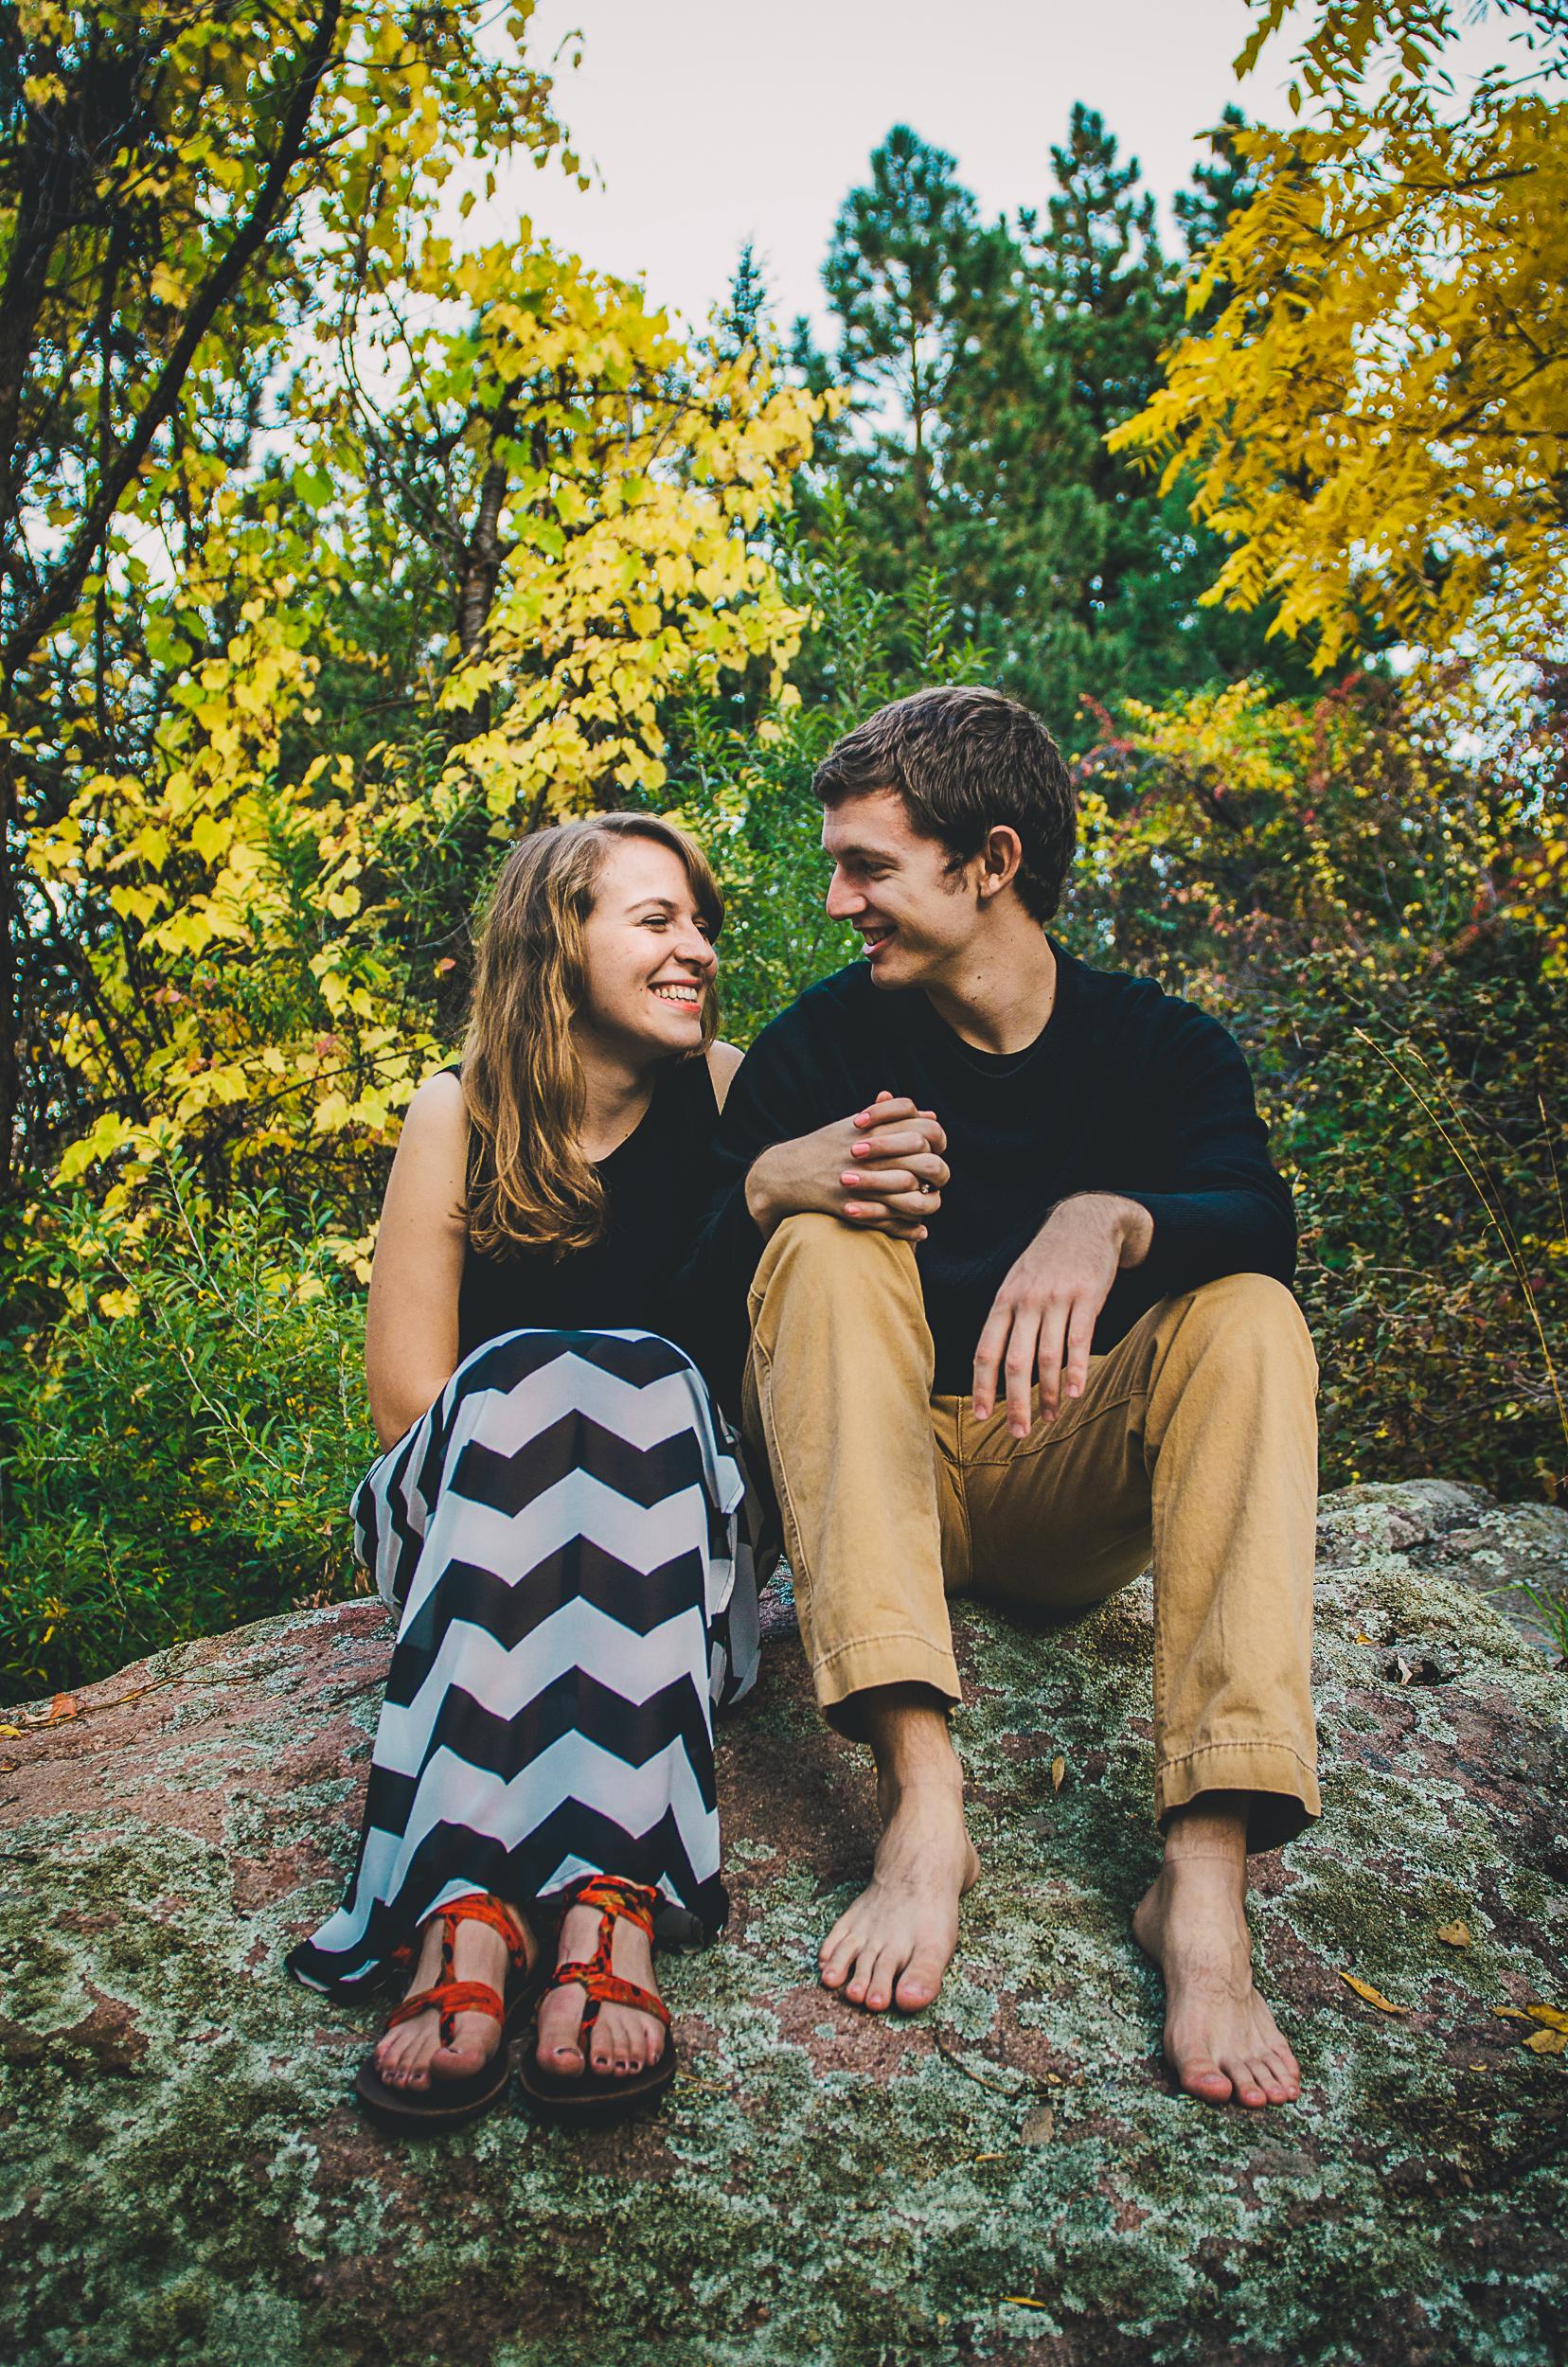 Amy&Jake-Engagements-JPEGS-1-31.jpg